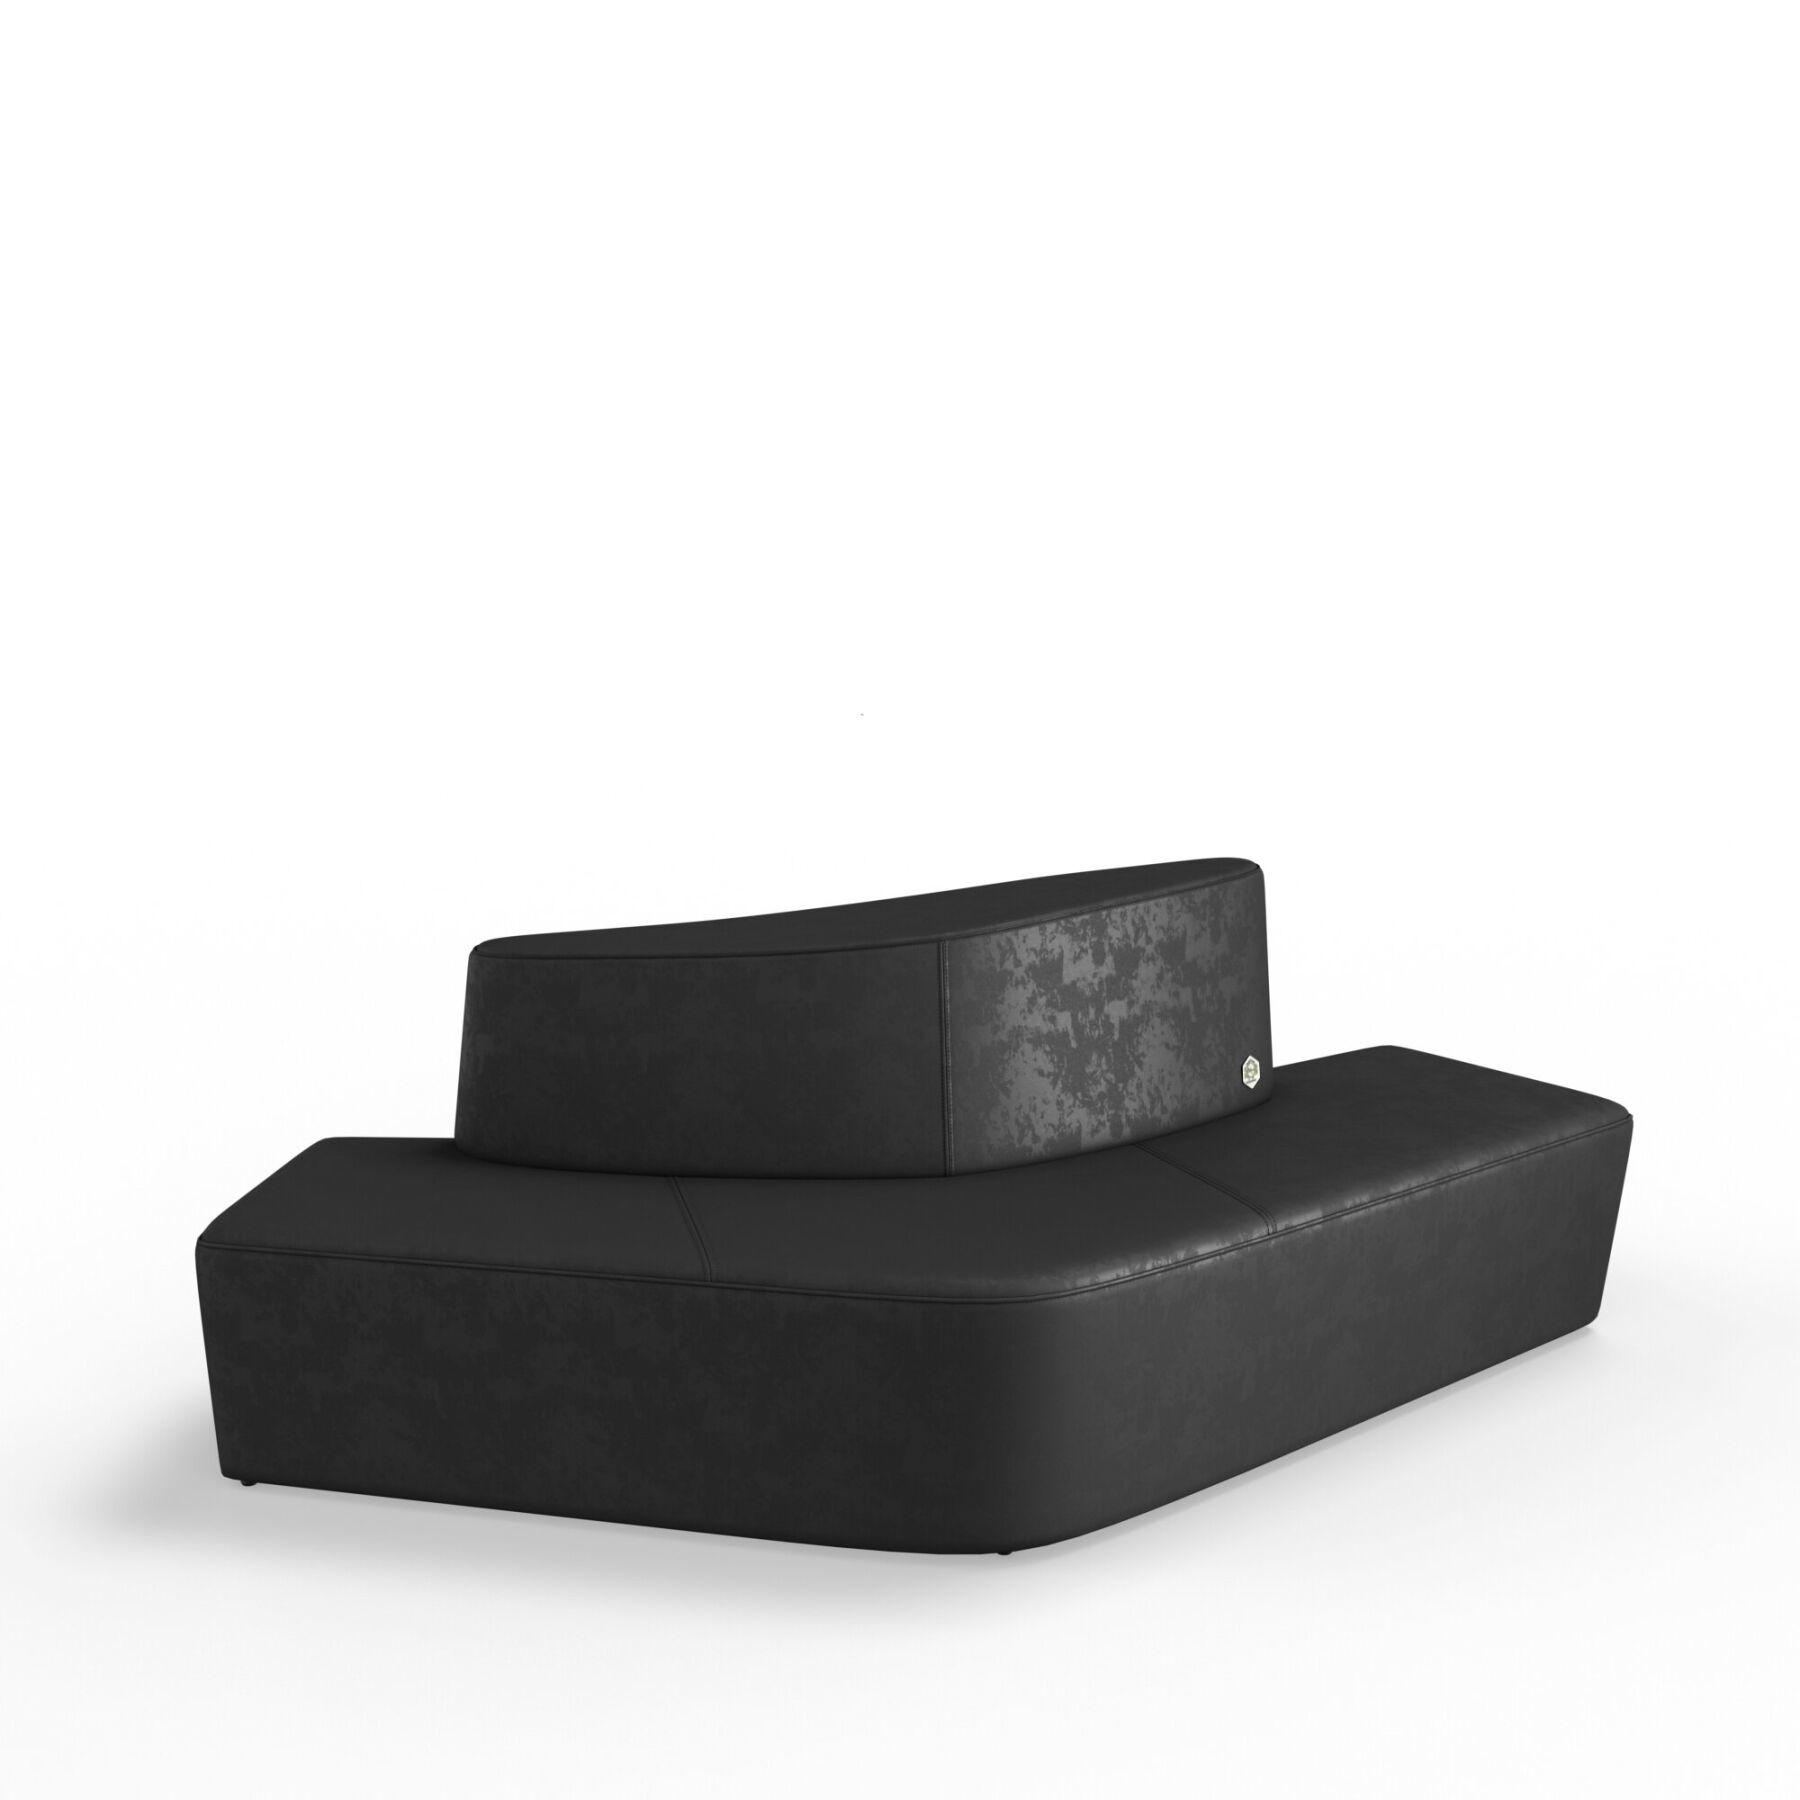 Четырехместный диван KULIK SYSTEM SLIDE_1 Антара Целый